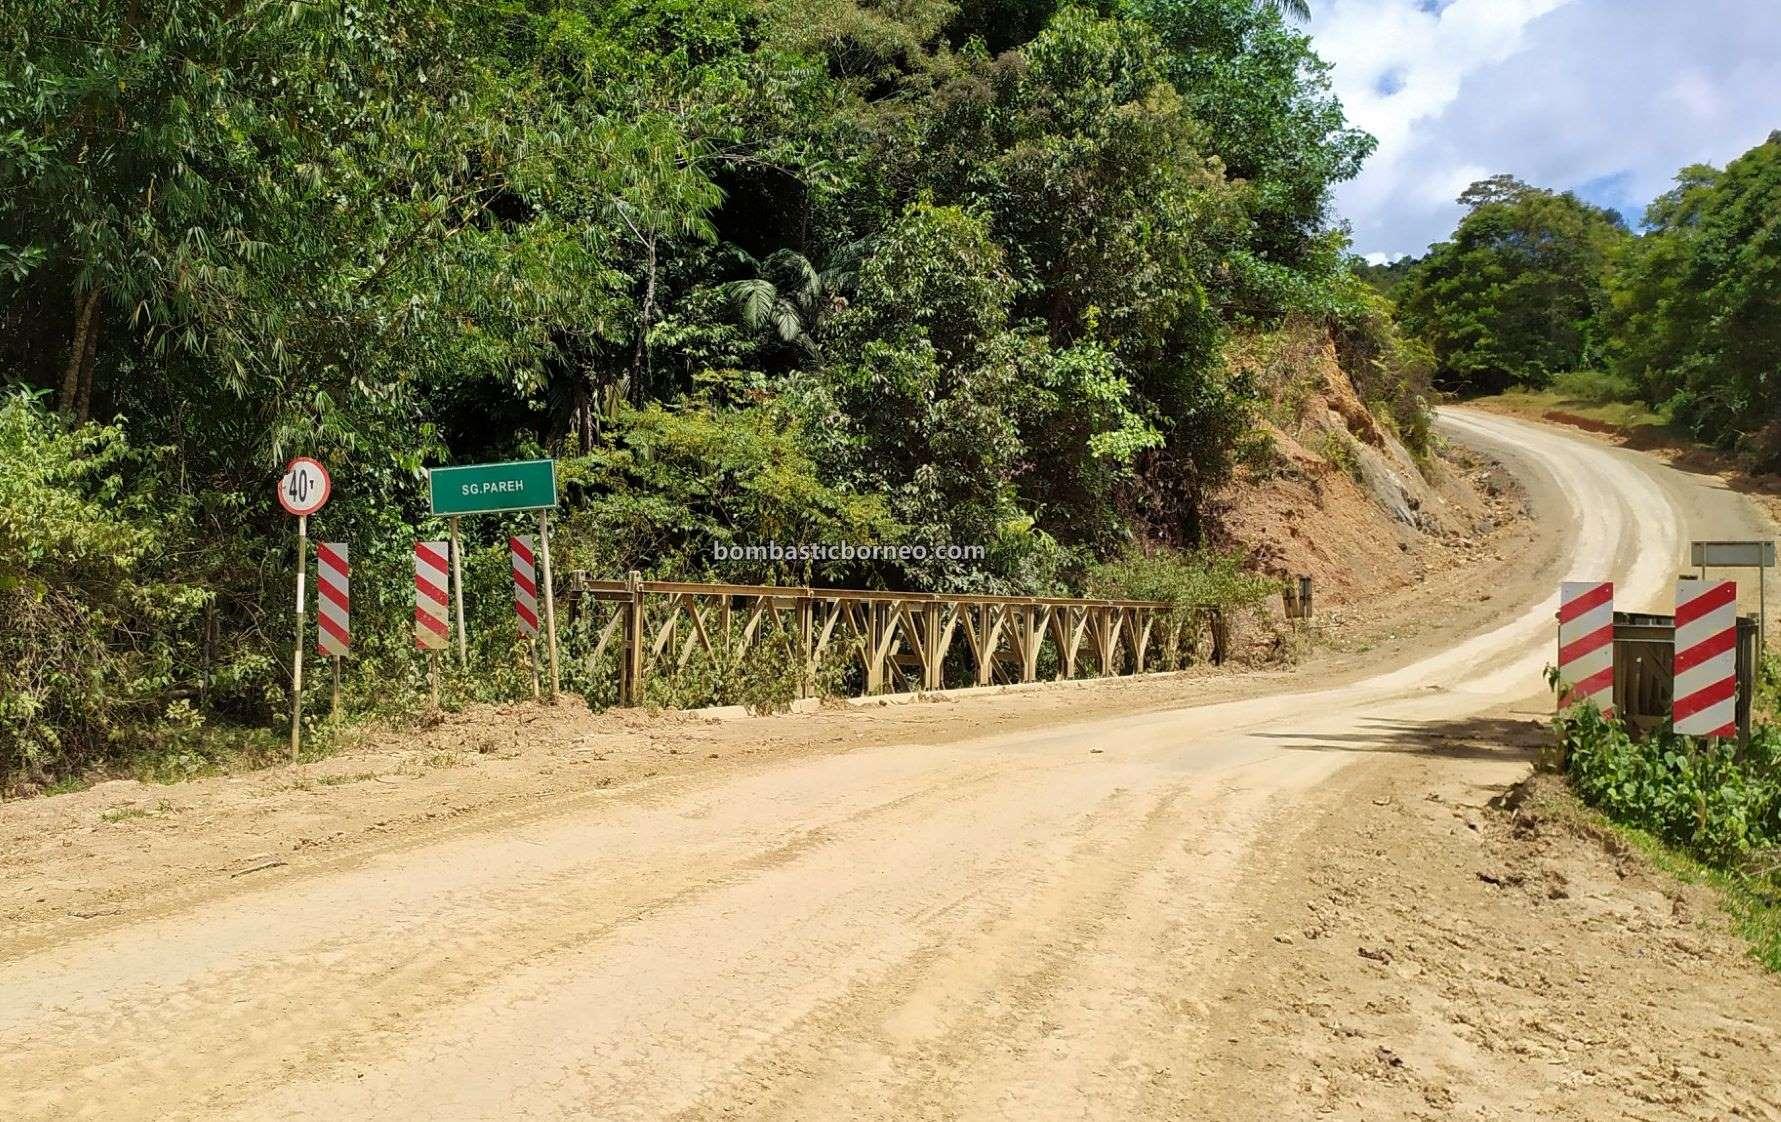 adventure, nature, outdoor, backpackers, destination, exploration, Interior, village, Maligan Highlands, Lawas, Limbang, Malaysia, tourism, Travel Guide, Trans Borneo